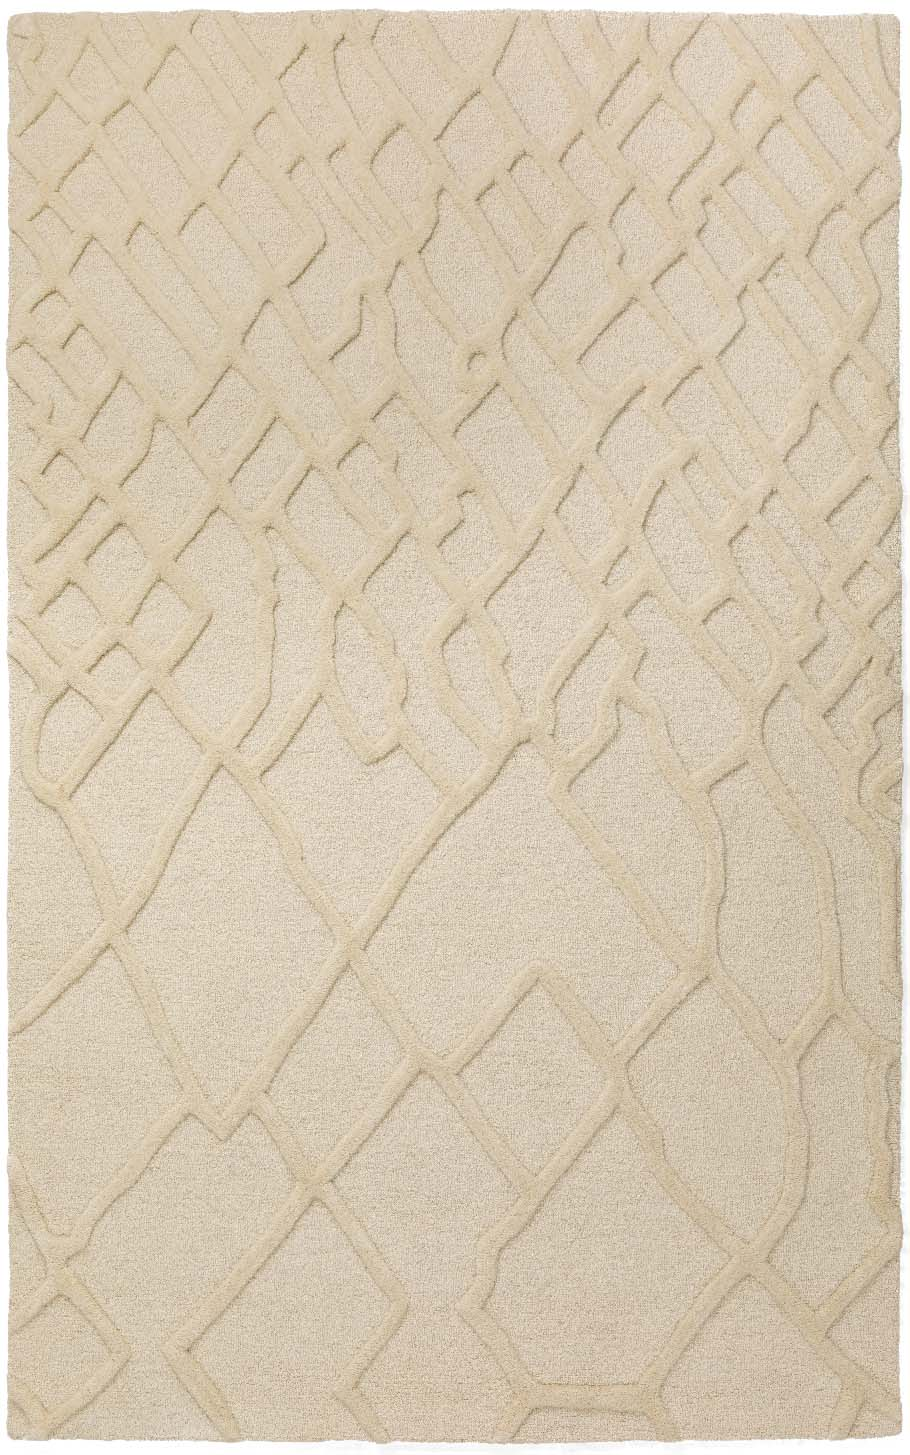 SR1 Ivory